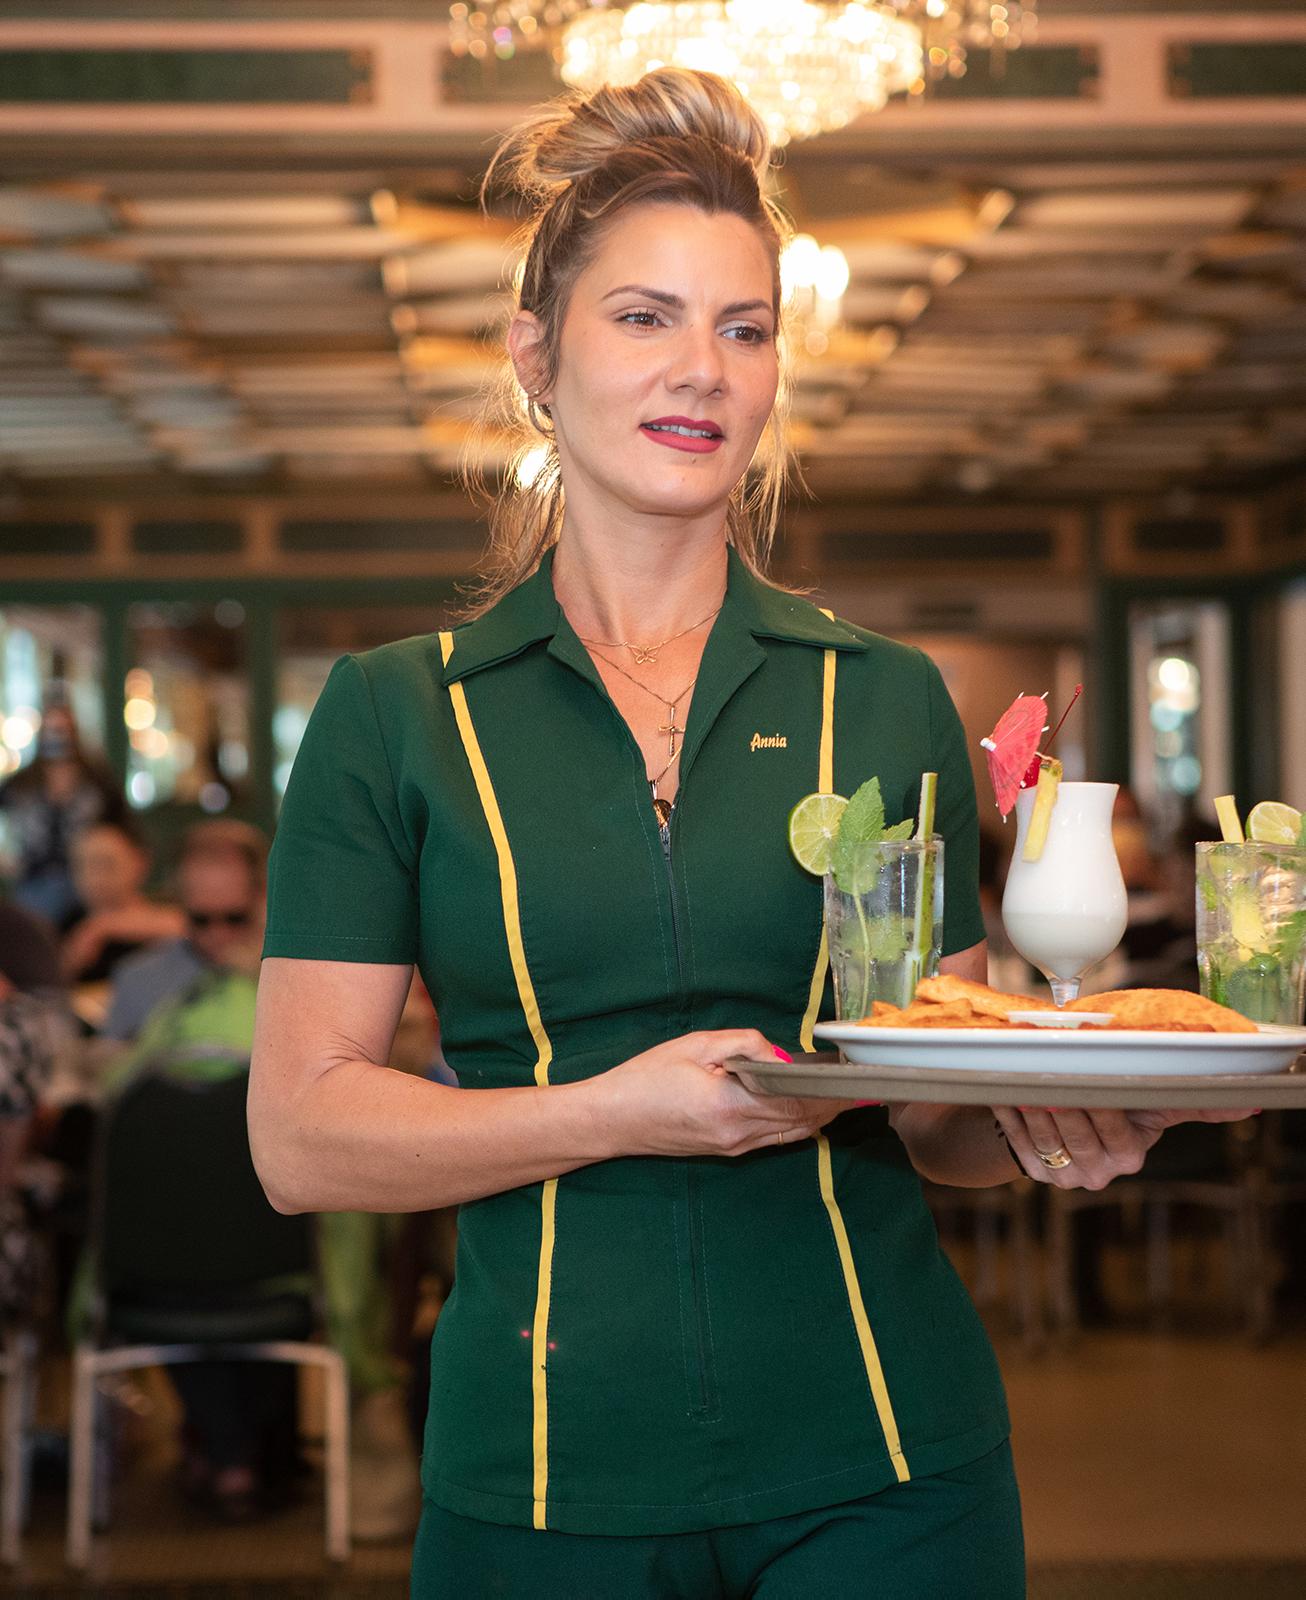 Waitress holding drinks